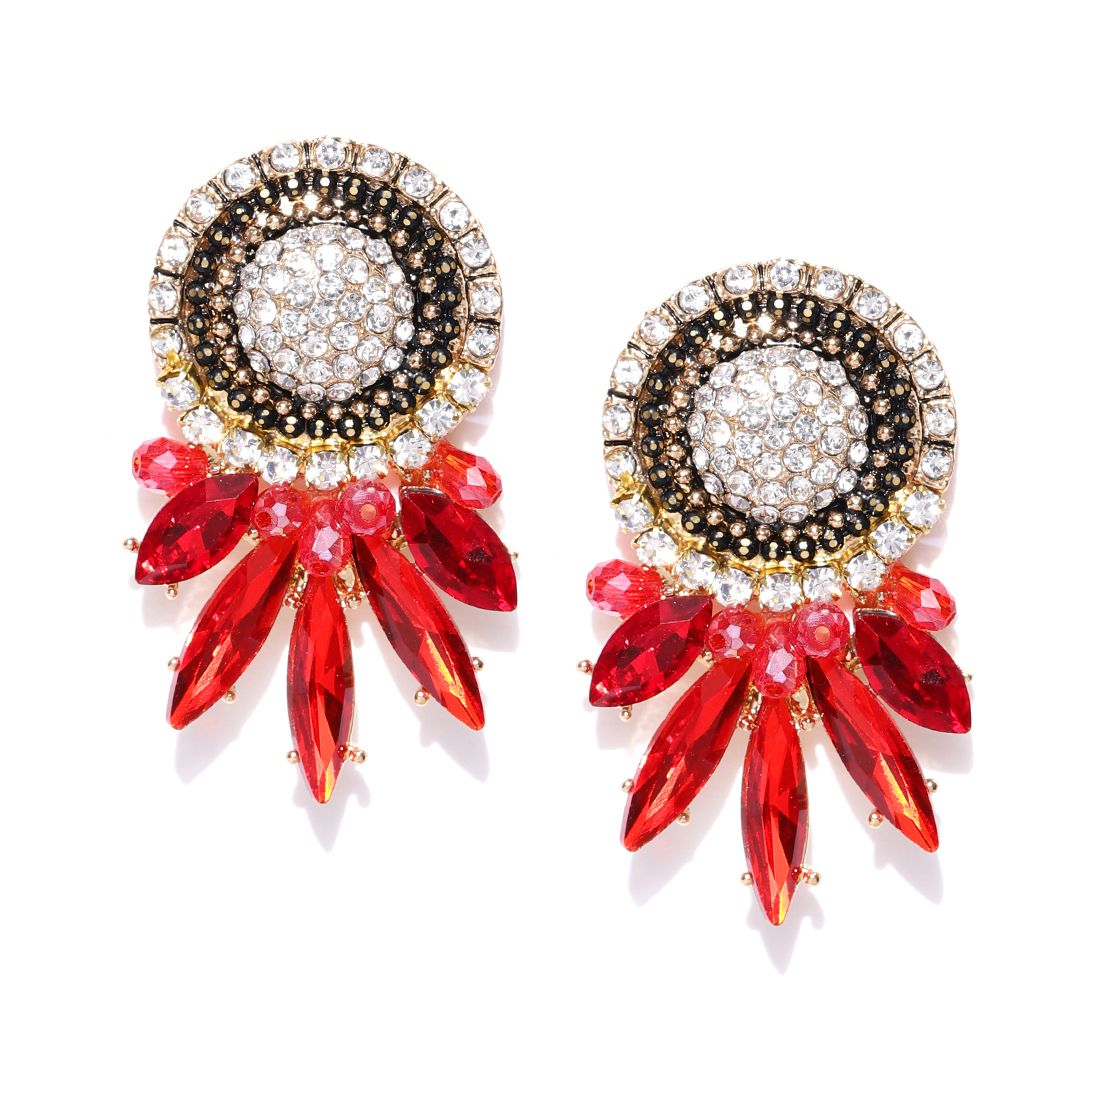 Jewels Galaxy Fresh Arrival Luxuria Splendid Design Swiss Austrian Diamond Geometric Glistening Oxidized Gold Earrings For Women/Girls